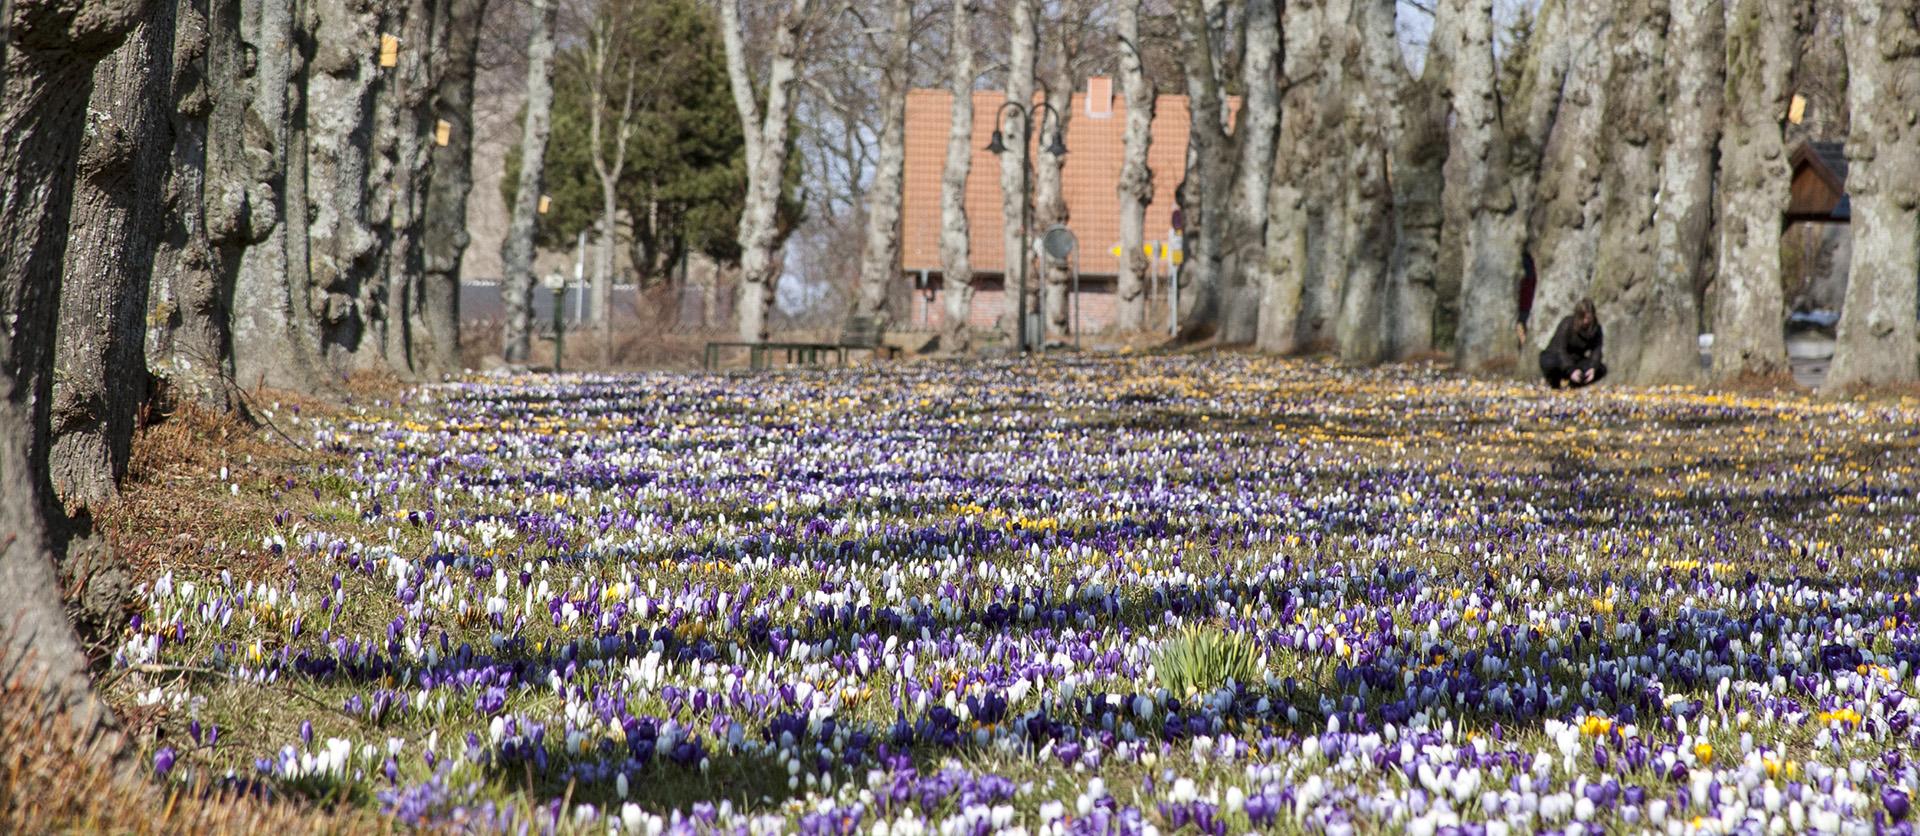 Thumbnail for the post titled: Barsbek tritt Gesellschaft zur Erhaltung historischer Gärten in Schleswig-Holstein bei